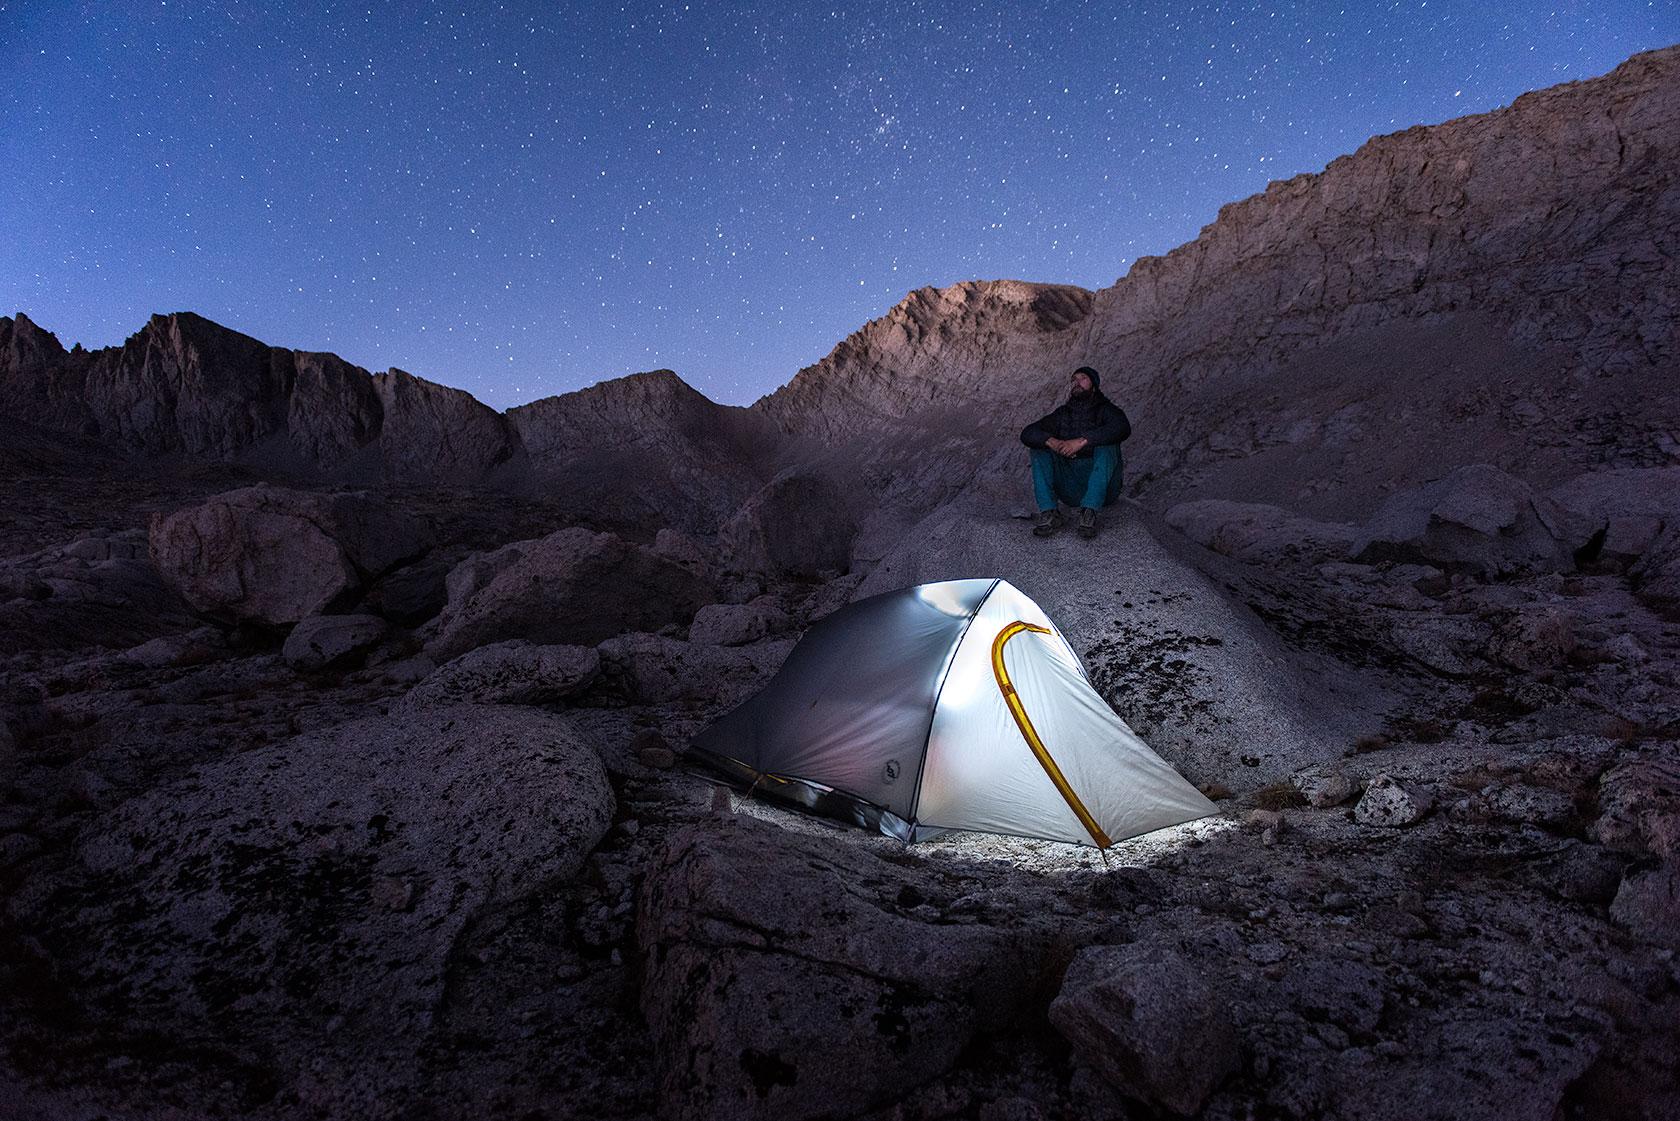 austin-trigg-big-agnes-tent-john-muir-trail-camping-mountain-night-stars-FlyCreek2-Forester-Pass.jpg